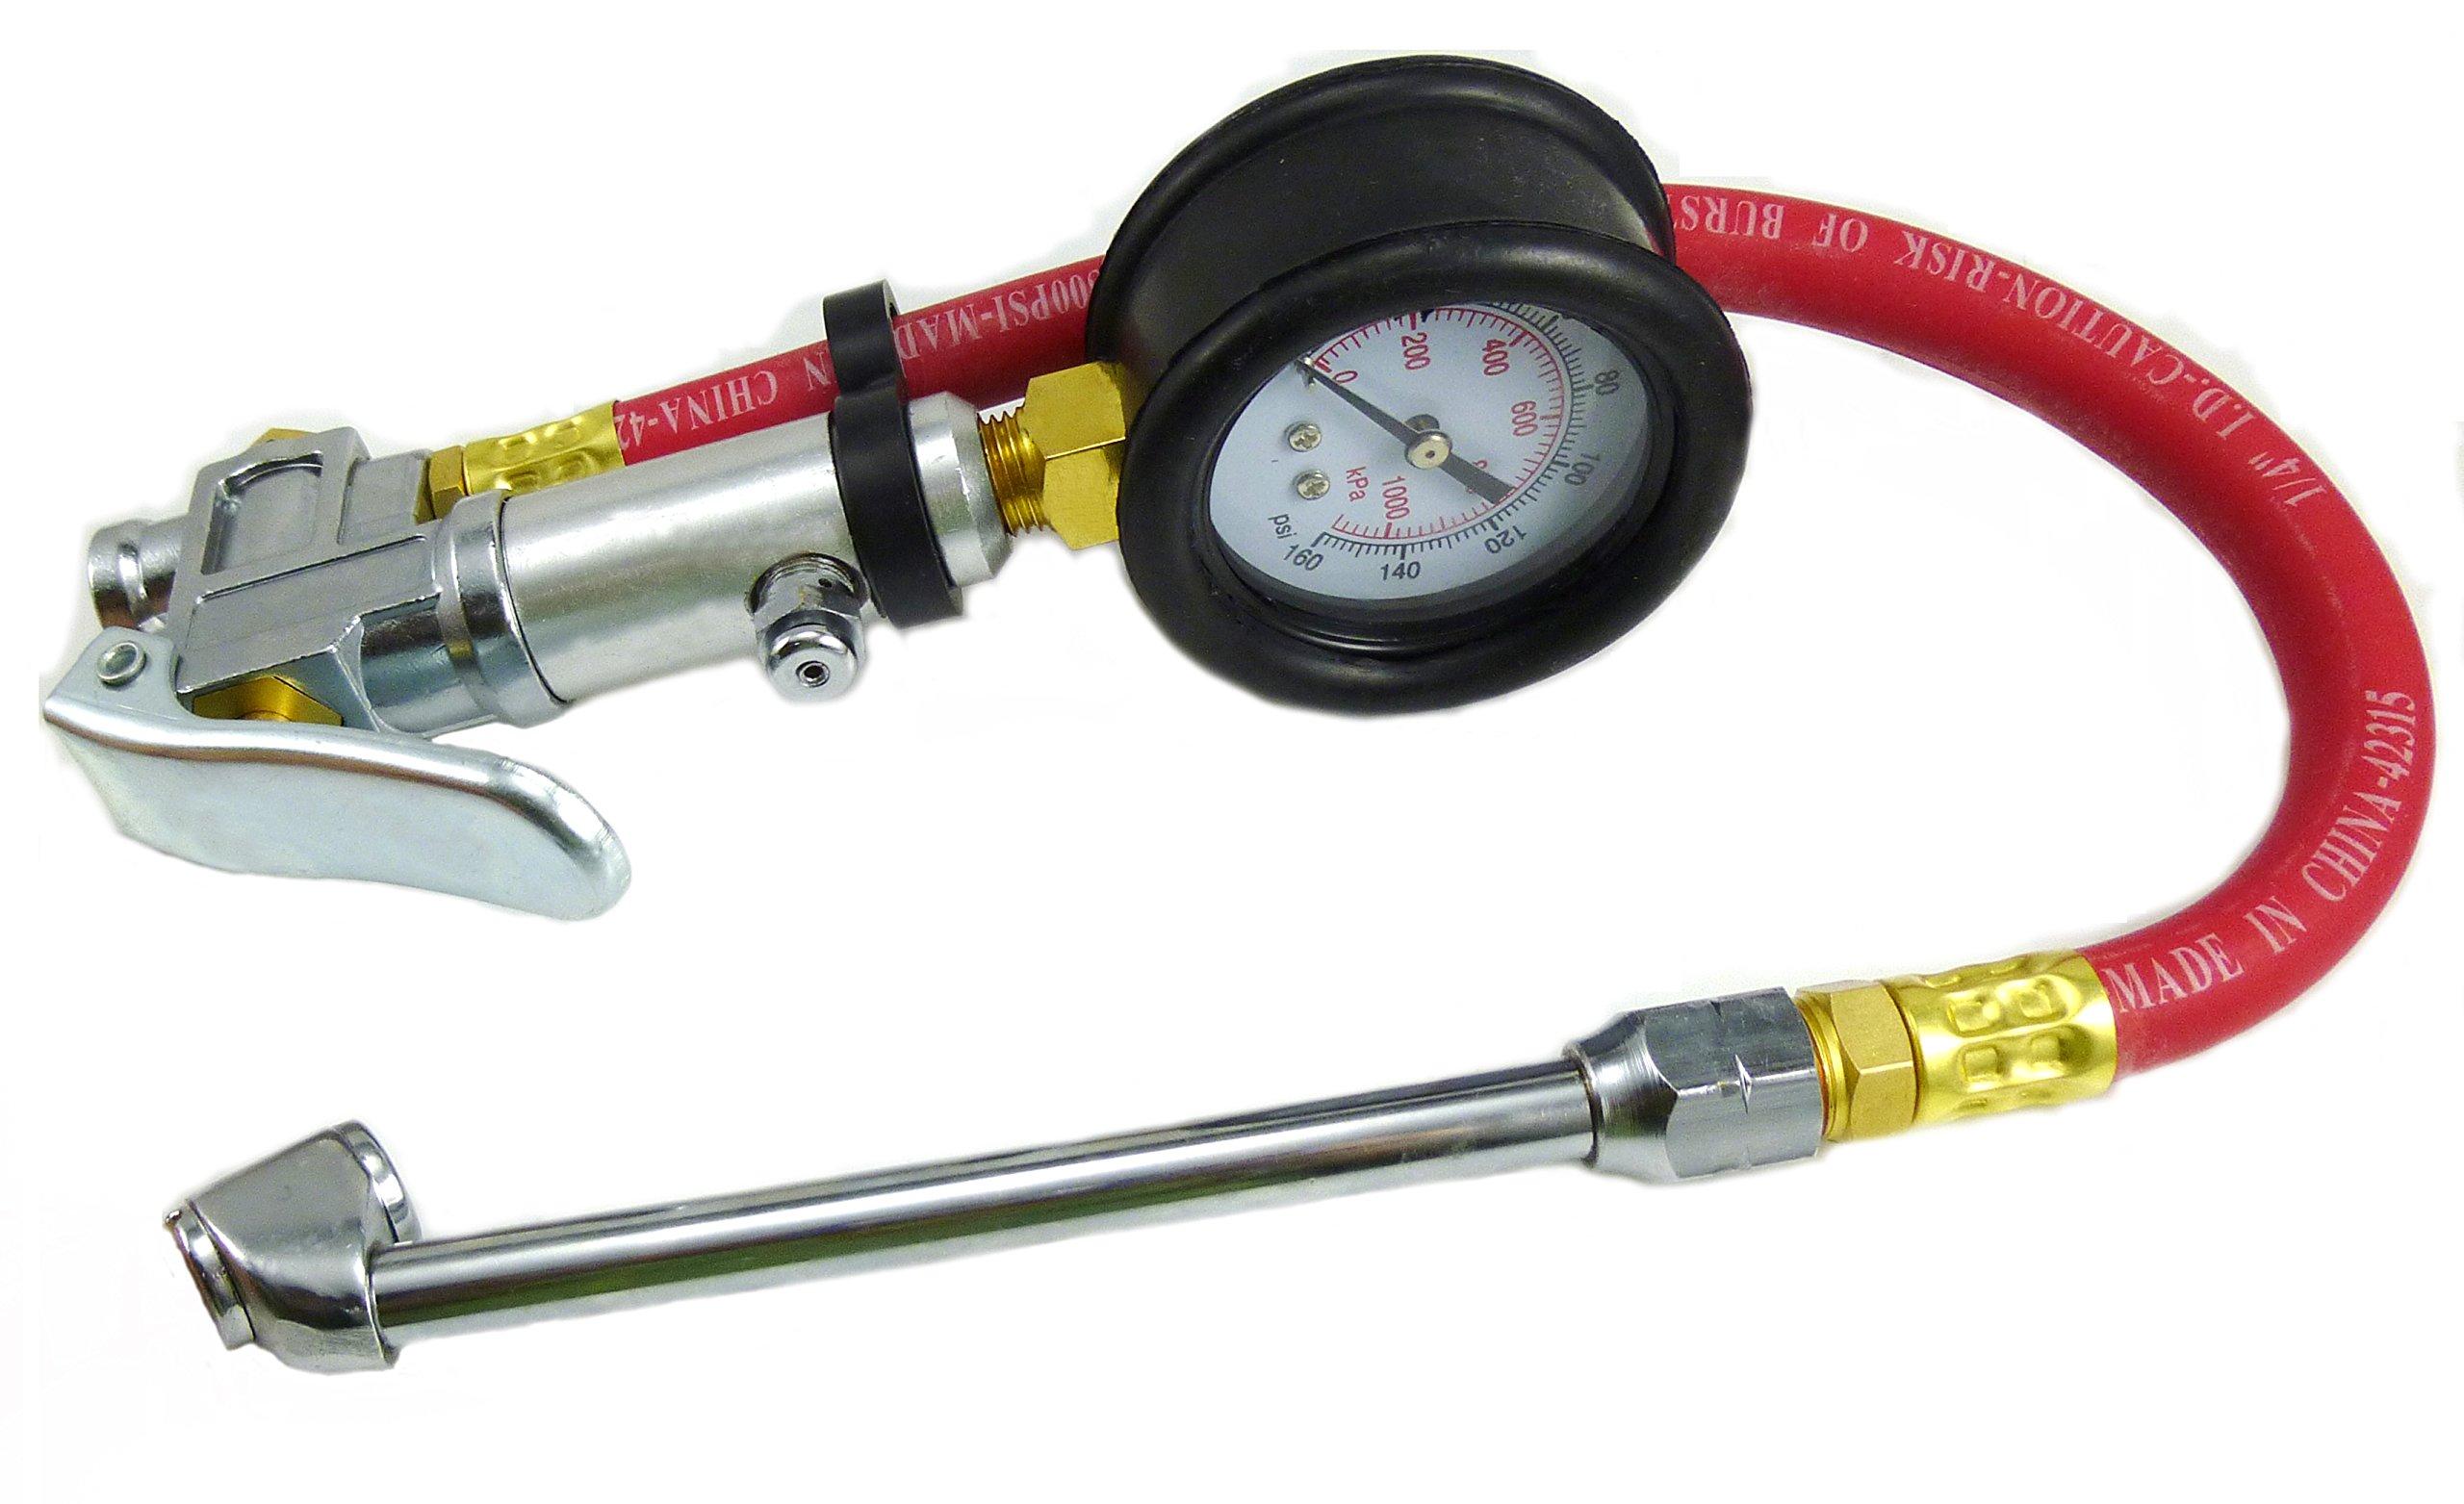 Dynamic Power Dual Foot Chuck Inflator Calibrated - 140 PSI. 100-100kpa in 20kpa. 1-10 bar in 0.2 bar gauge. D-TG-4